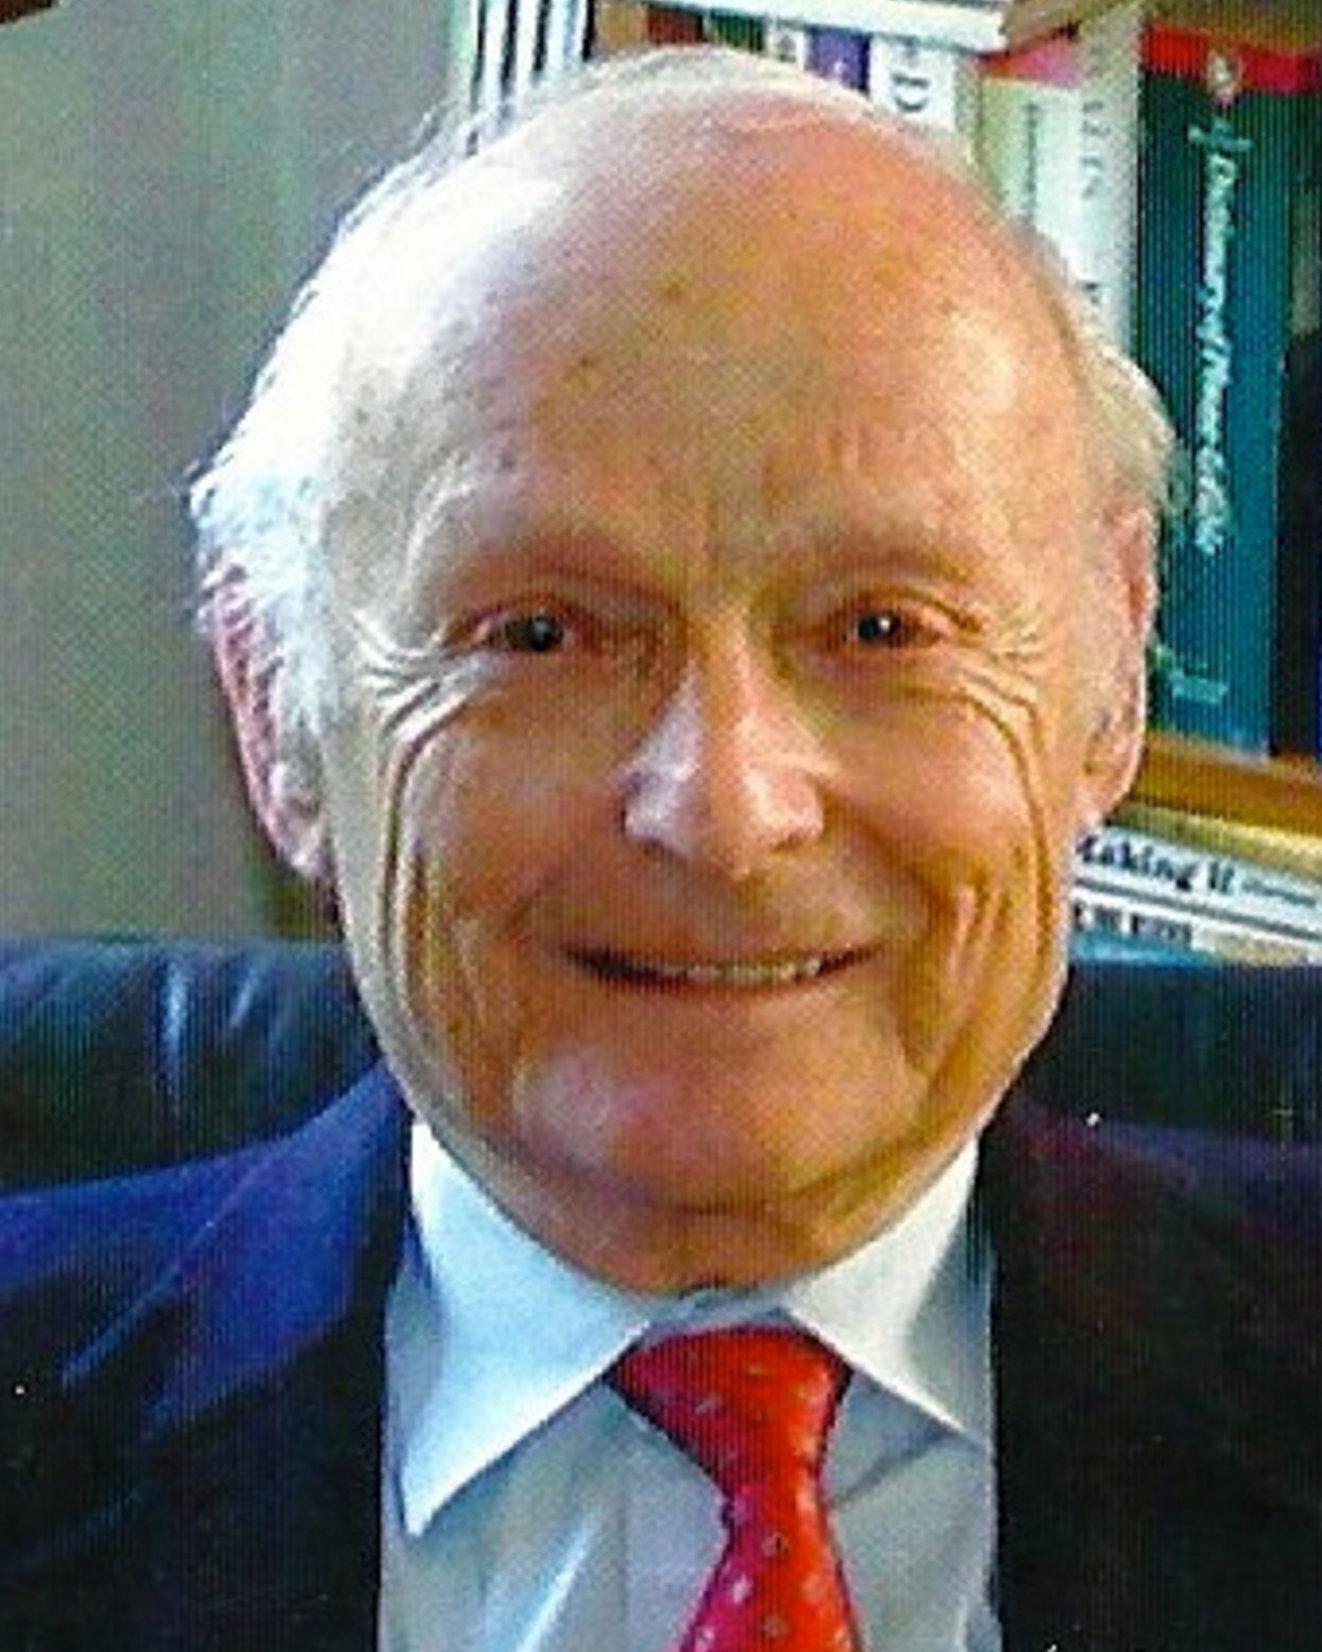 norman fruman coleridge scholar dies at 88 the new york times